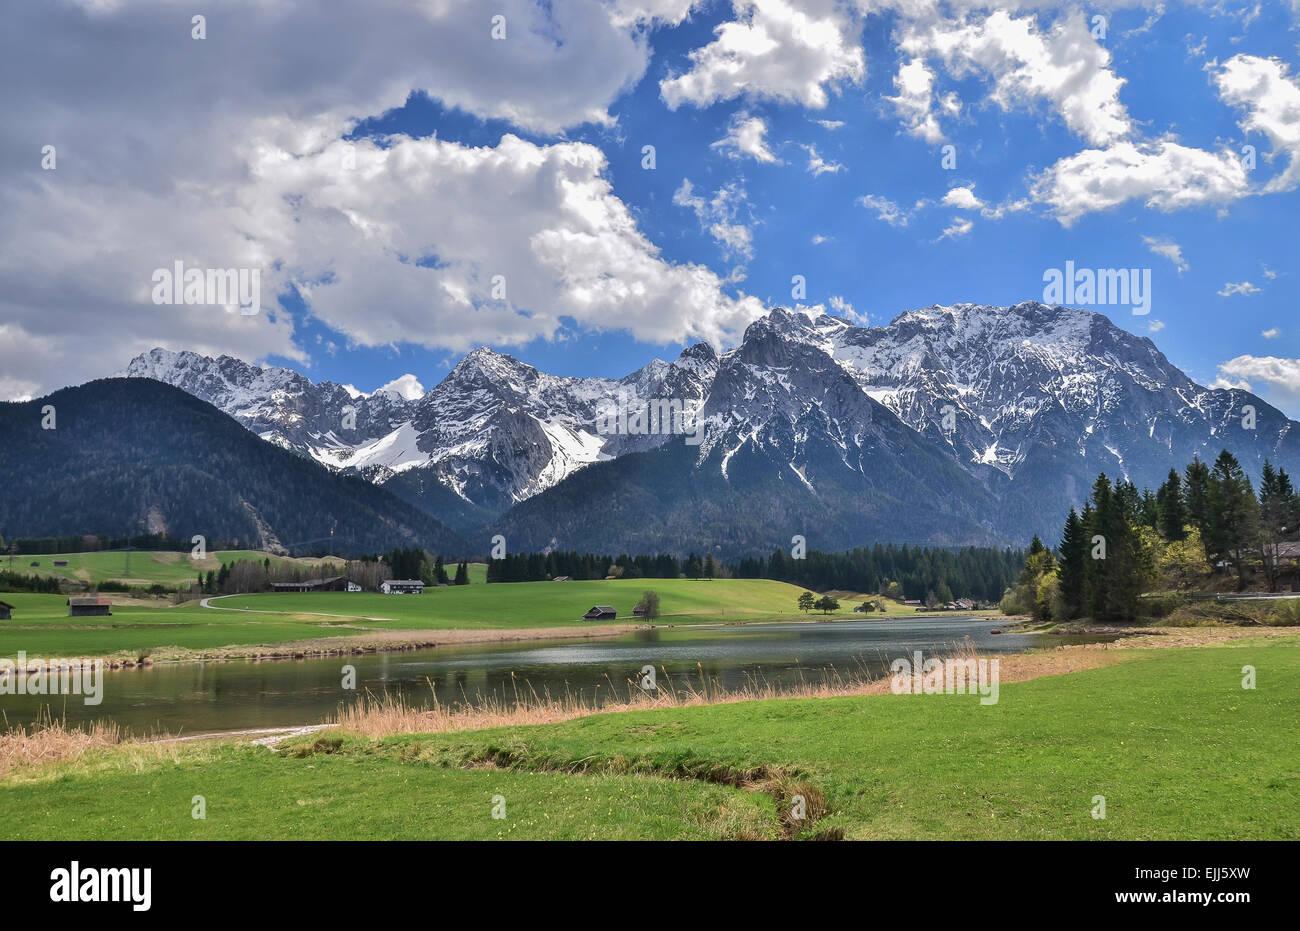 Upper Bavaria Youthhostel Mittenwald Schmalensee, Lake Schmalsee, Karwendel mountain range - Stock Image